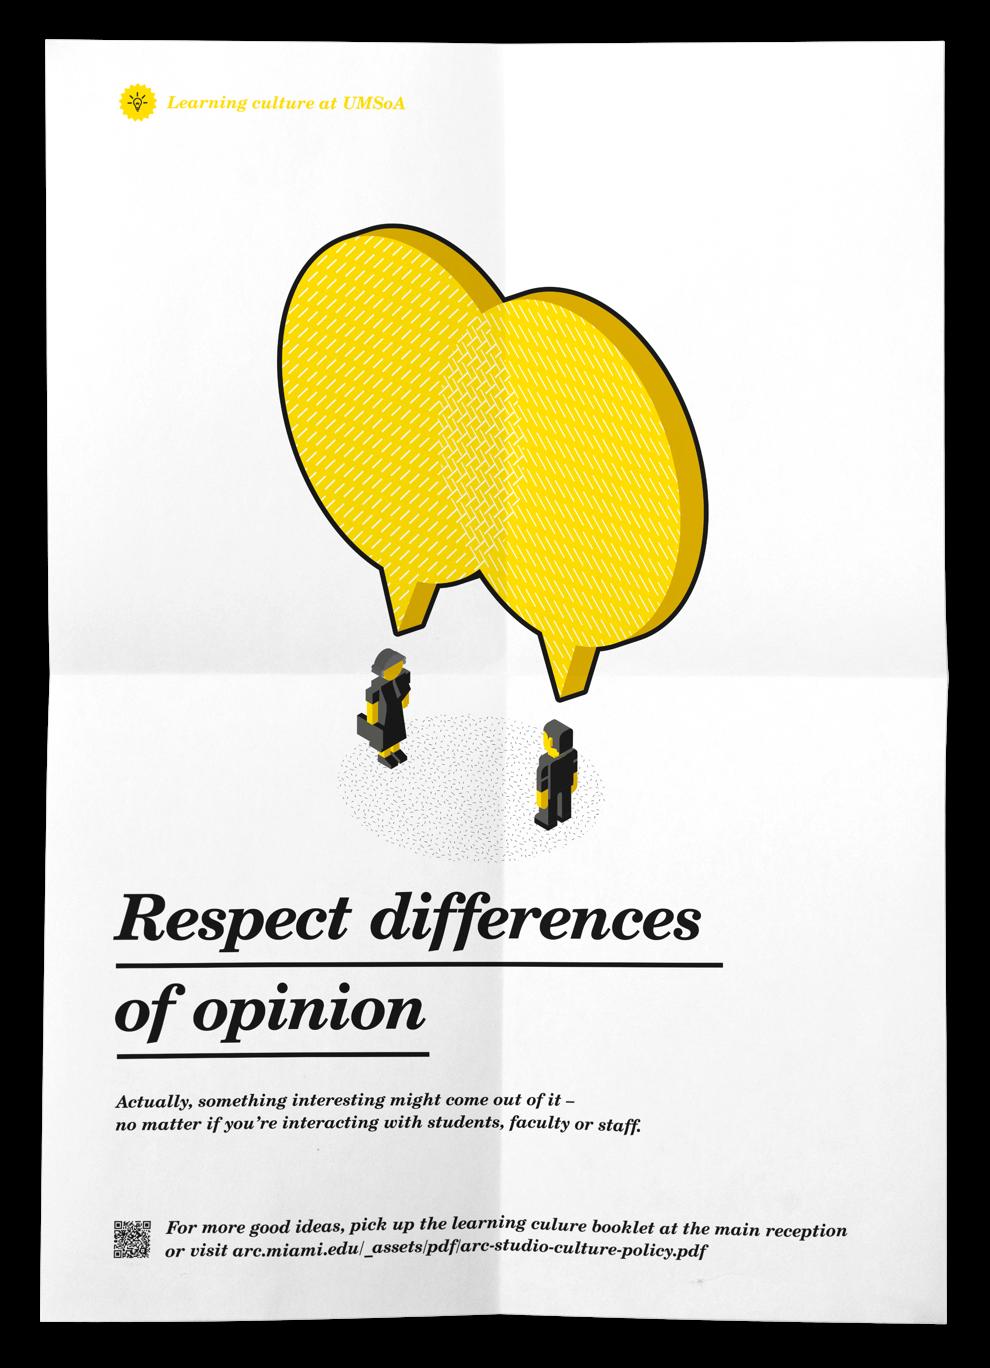 um-learningculture-poster-illu